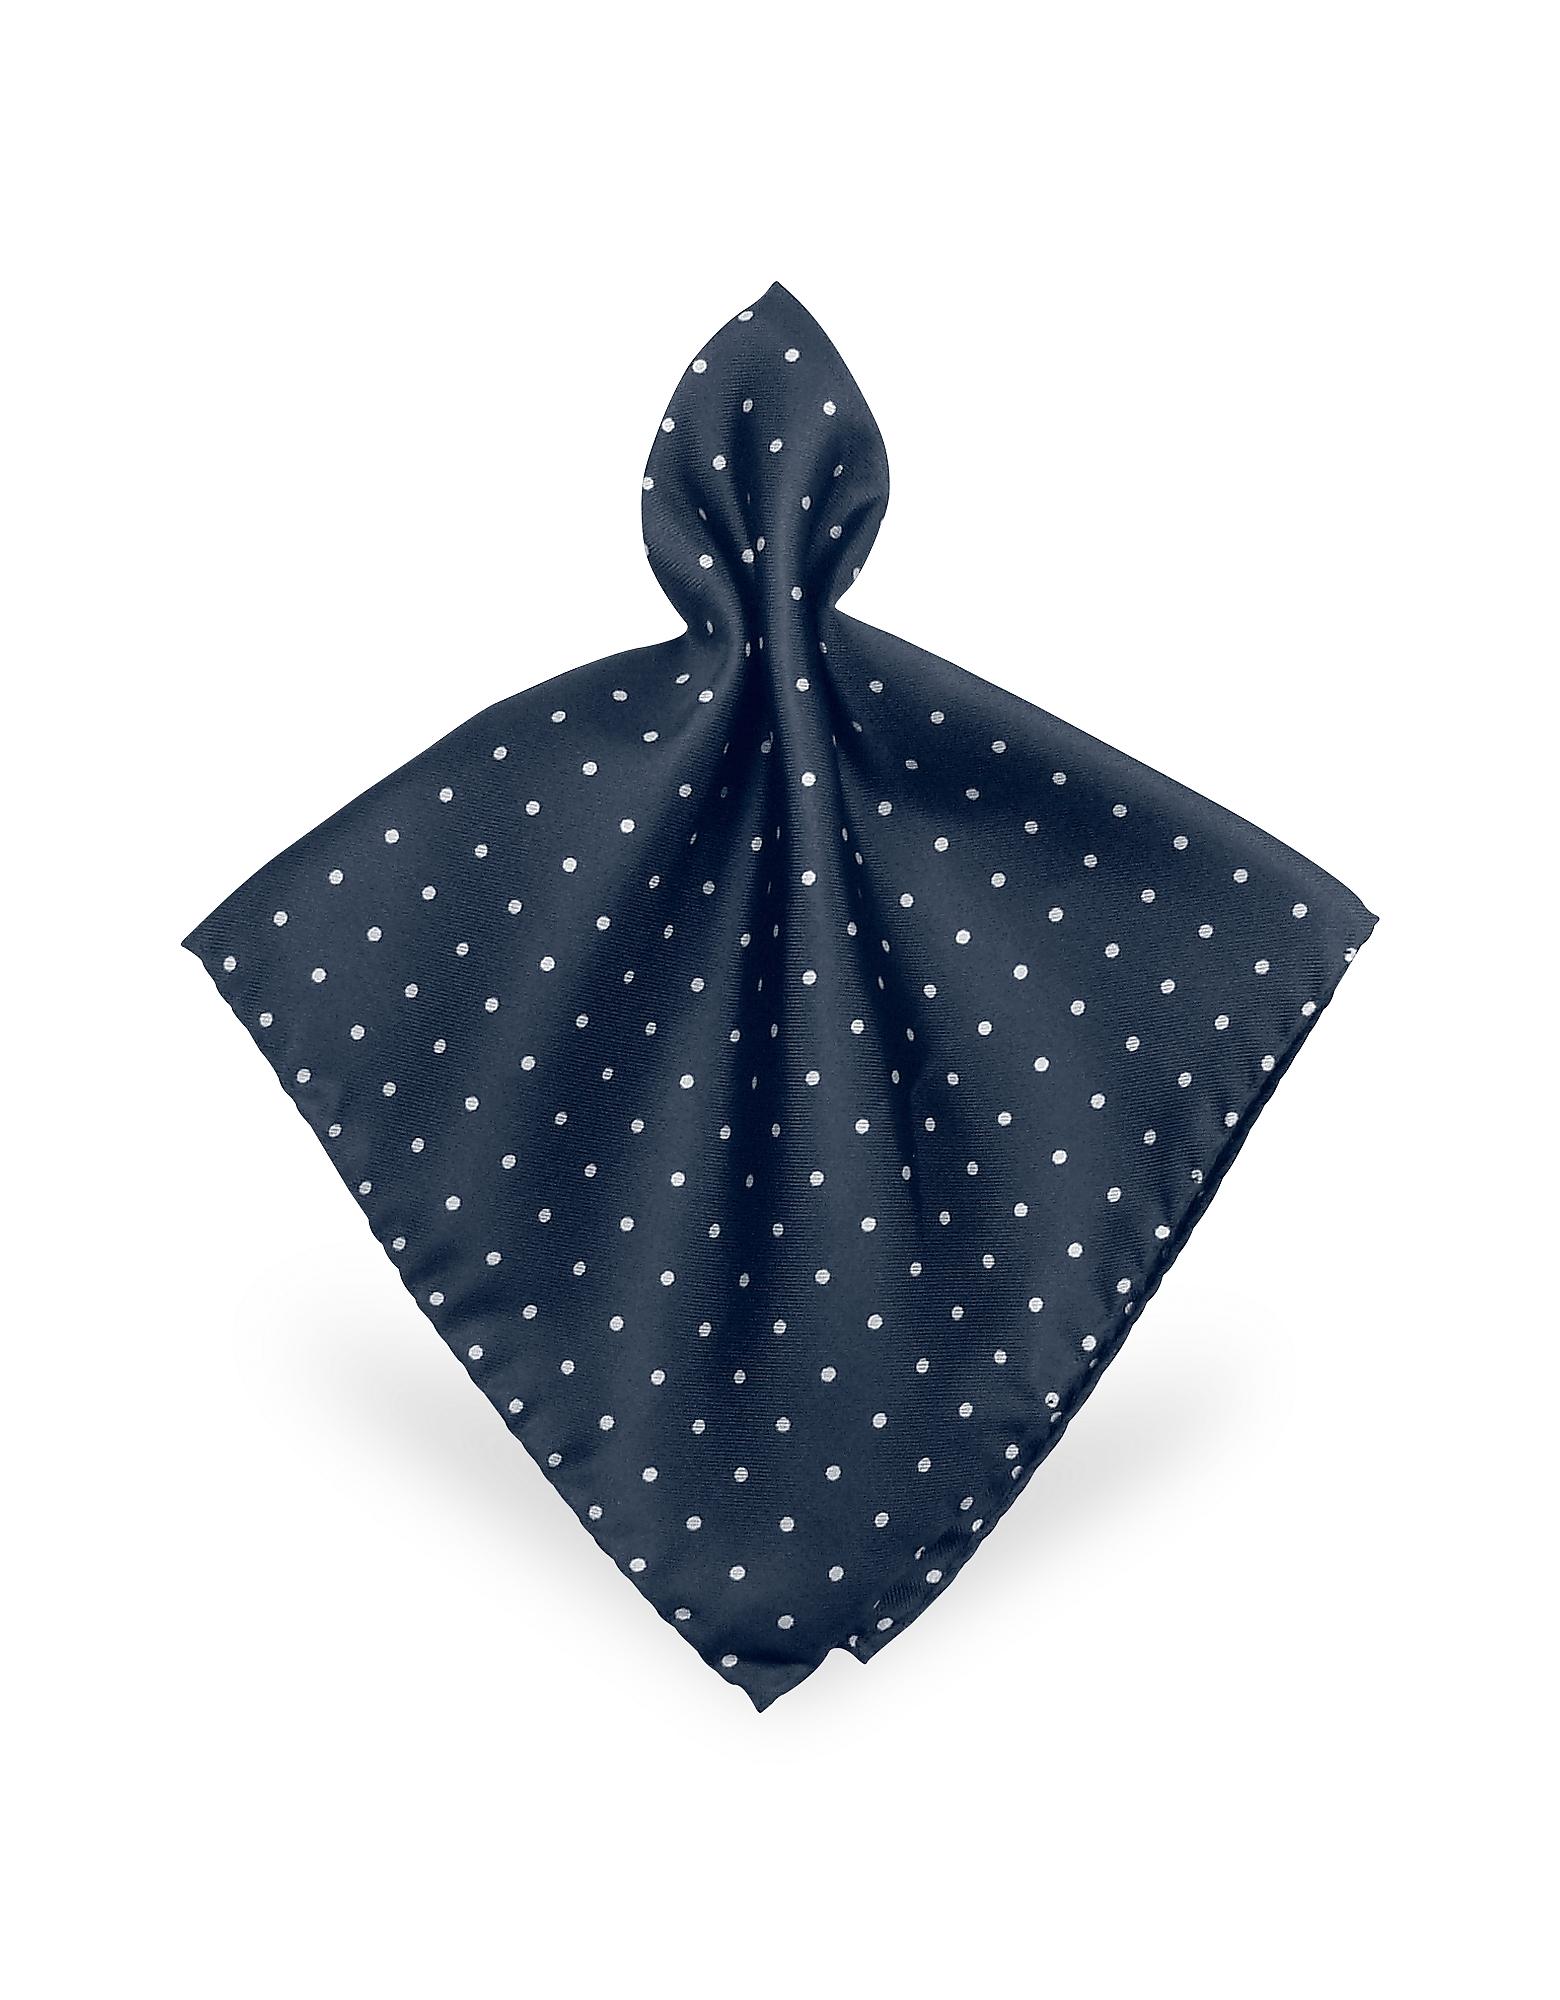 Forzieri Pocket Squares, Polkadot Twill Silk Pocket Square